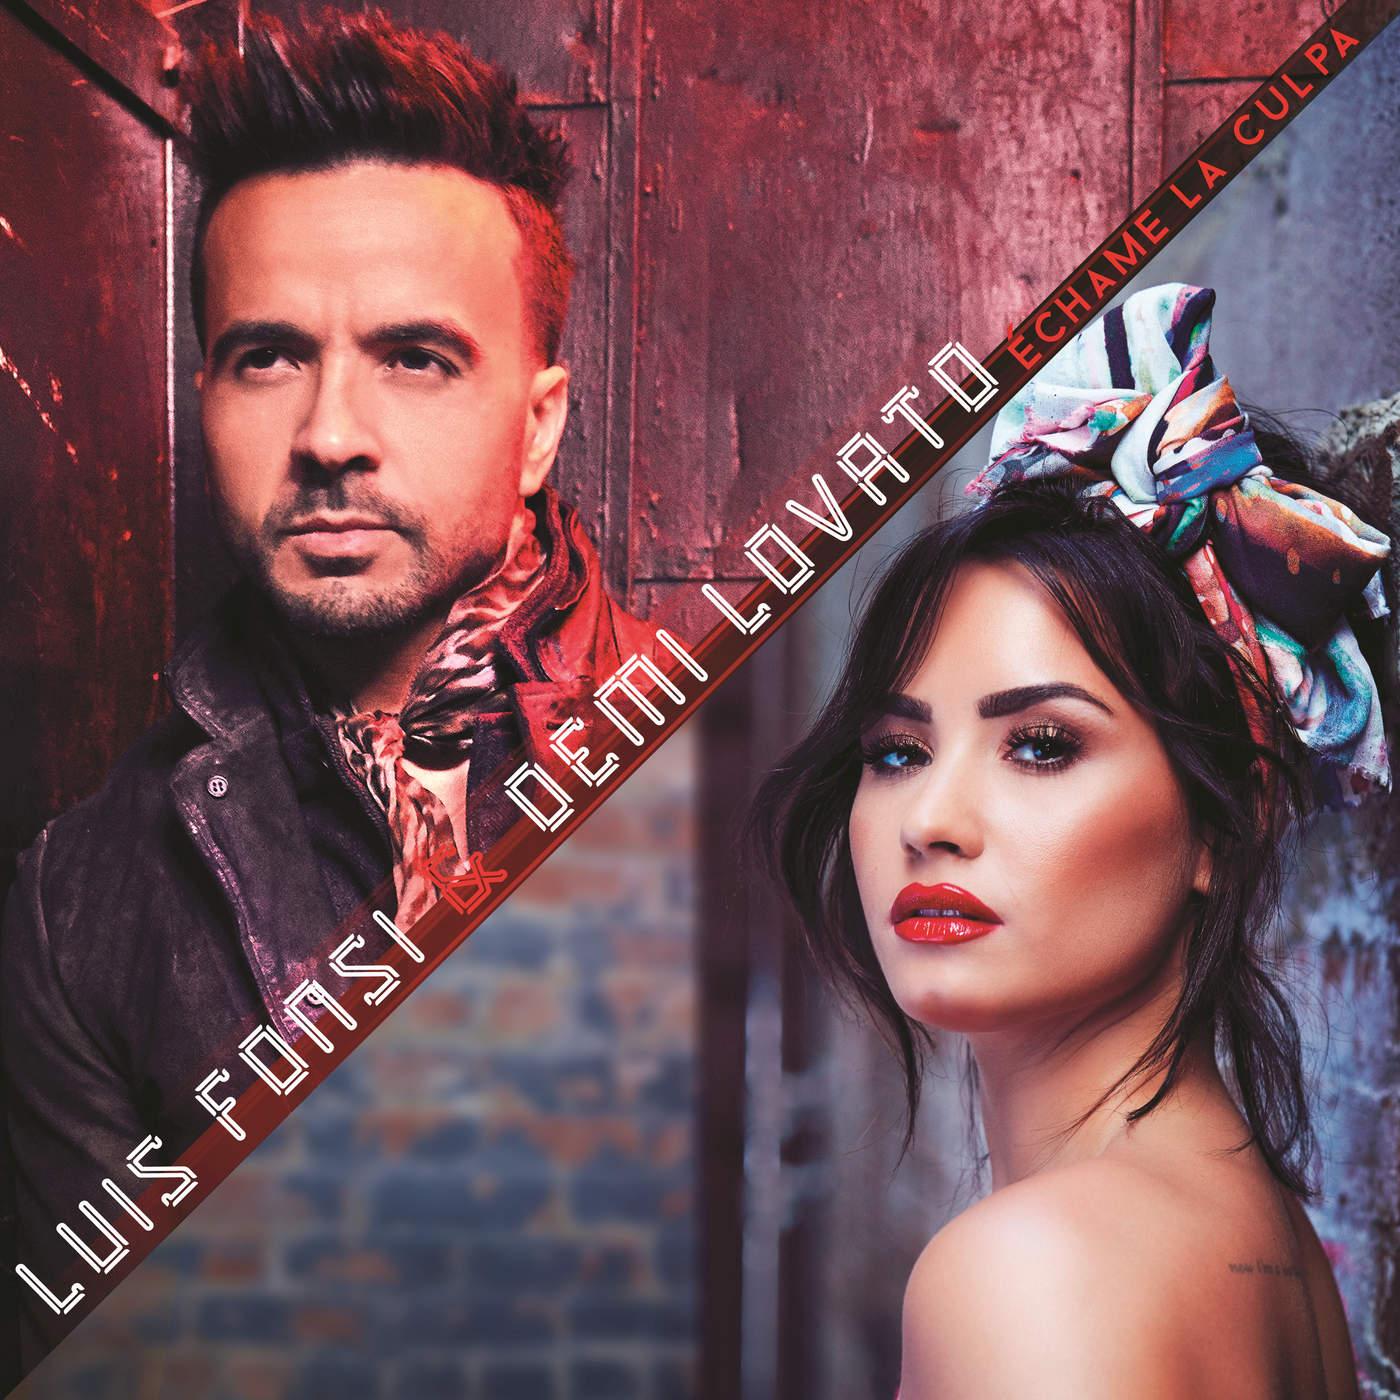 Luis Fonsi & Demi Lovato - Échame La Culpa - Single